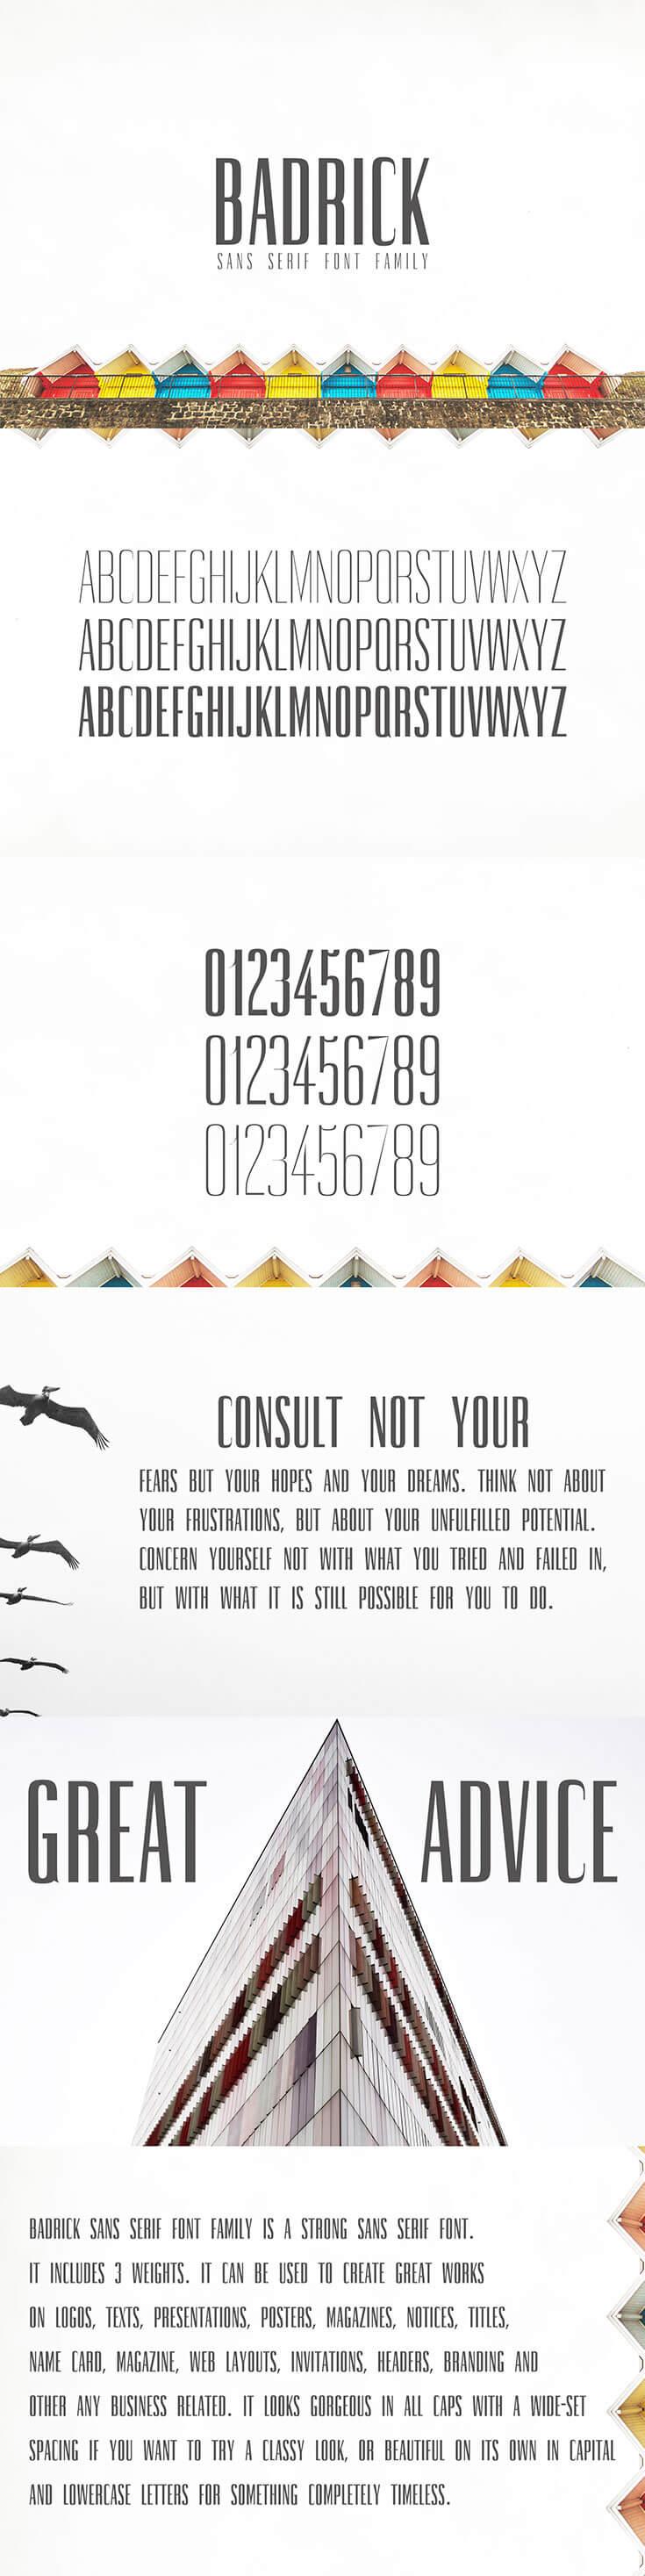 Badrick Sans Serif Font Family is a stylish condensed sans serif typeface.